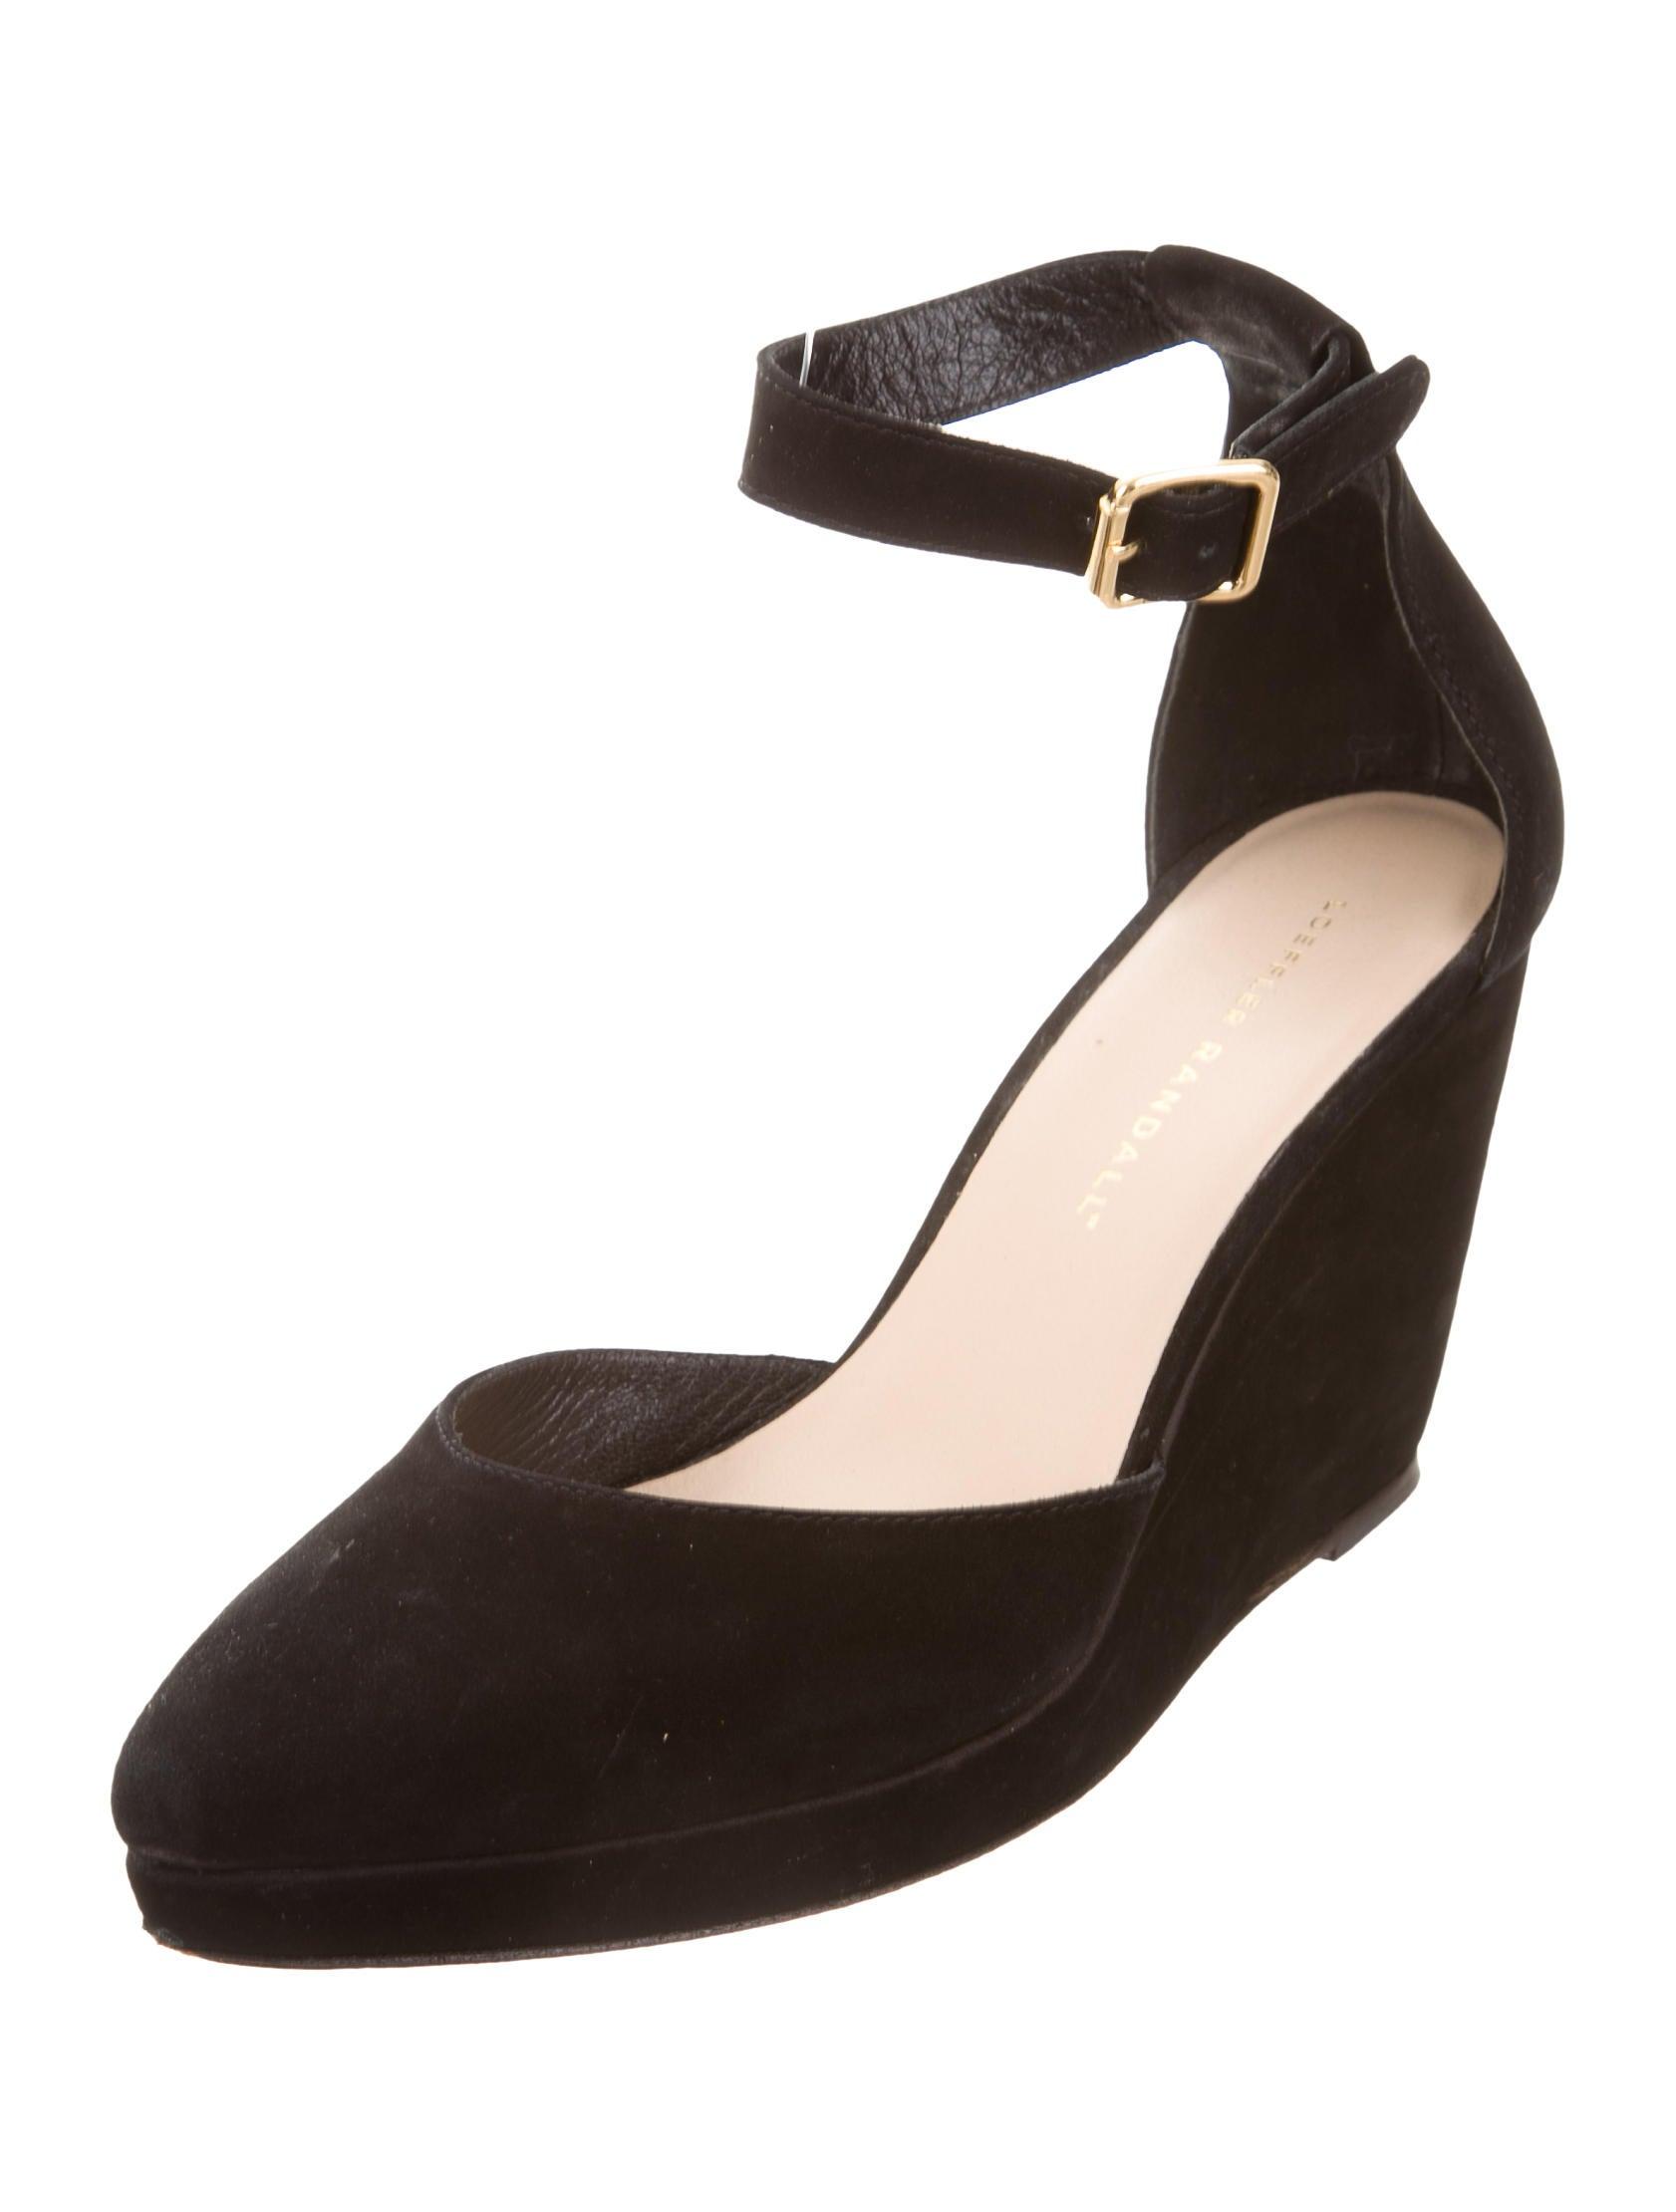 loeffler randall pointed toe wedge pumps shoes